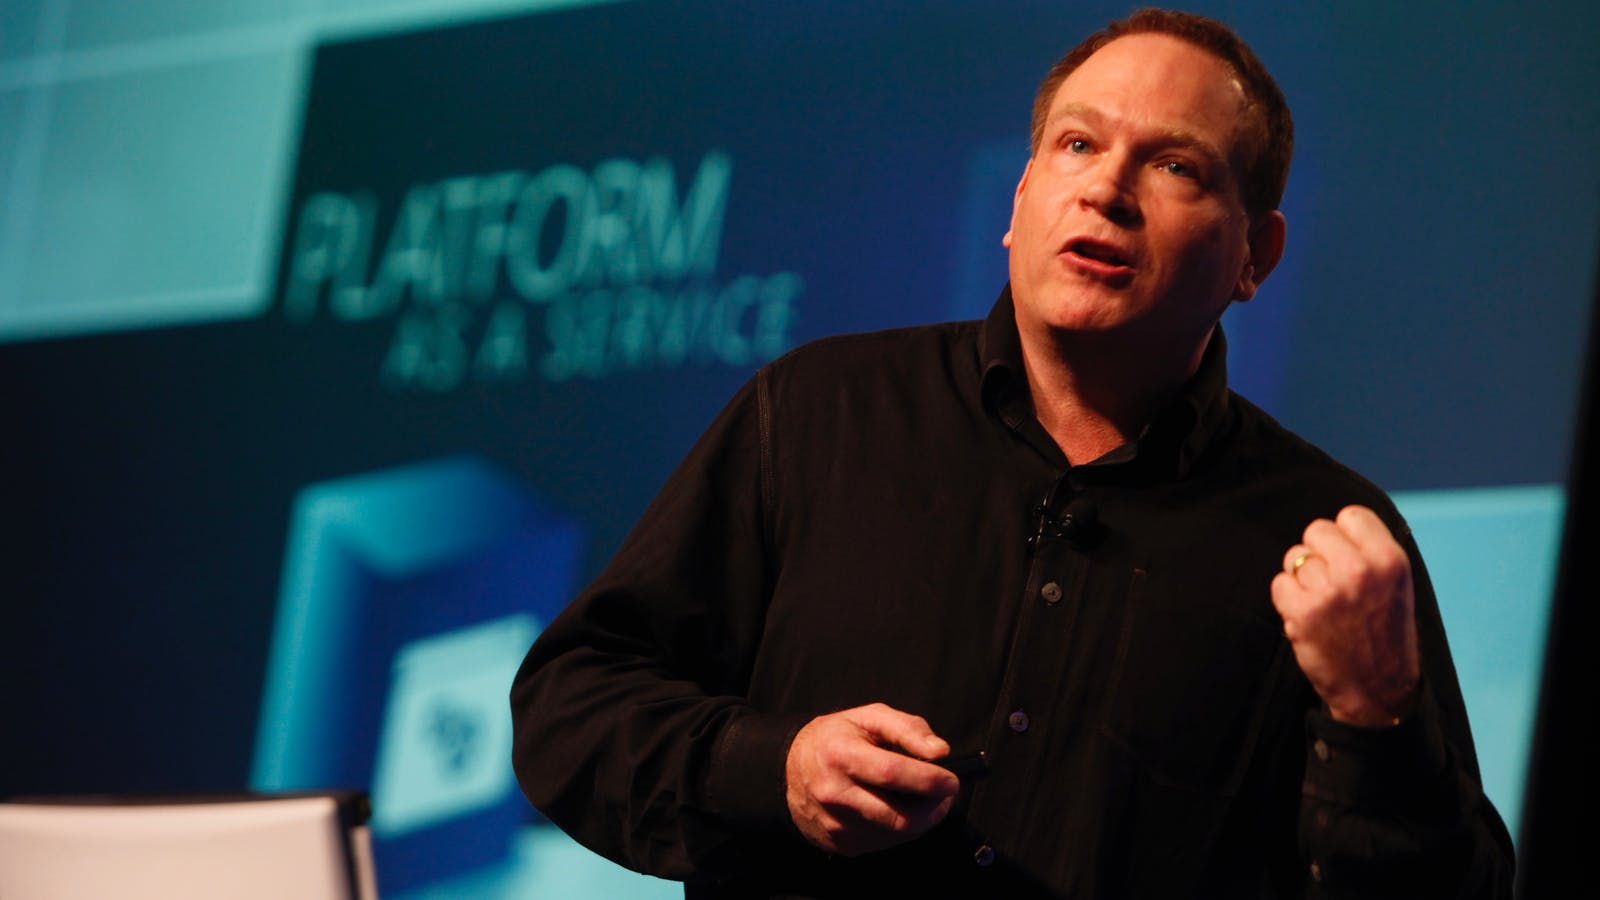 Snowflake CEO Bob Muglia. Photo by Flickr/MicrosoftPDC